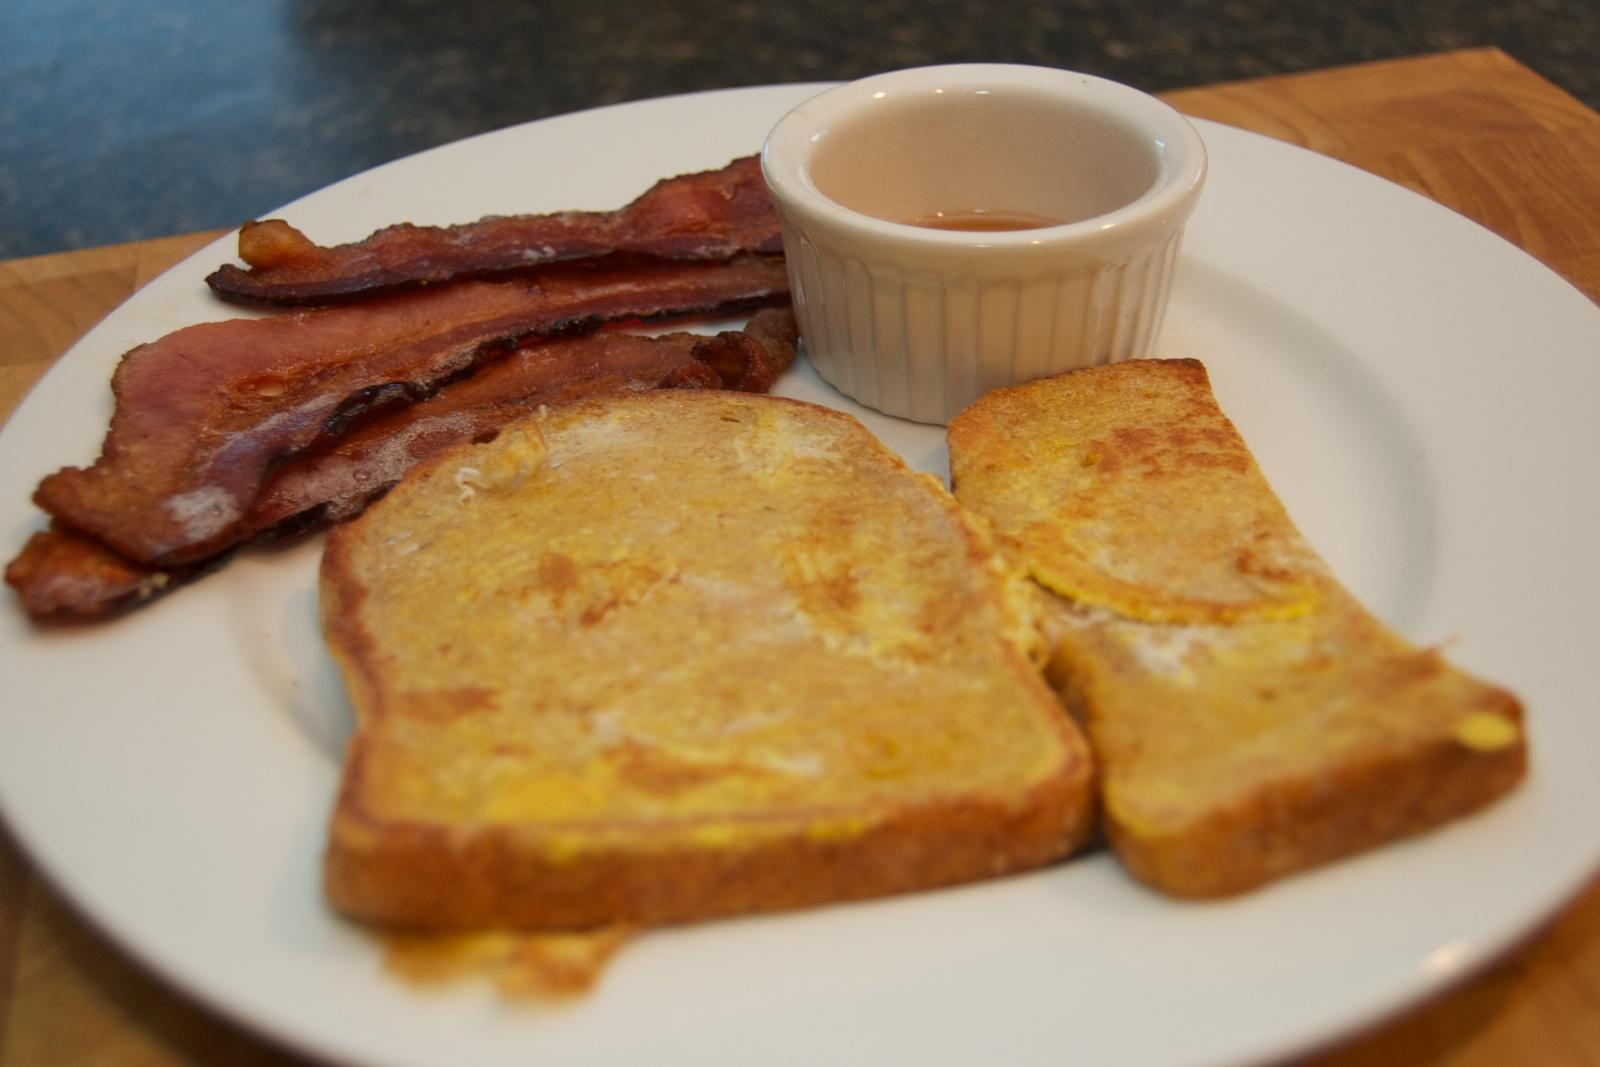 http://blog.rickk.com/food/2011/01/22/ate.2011.01.22.b1.jpg